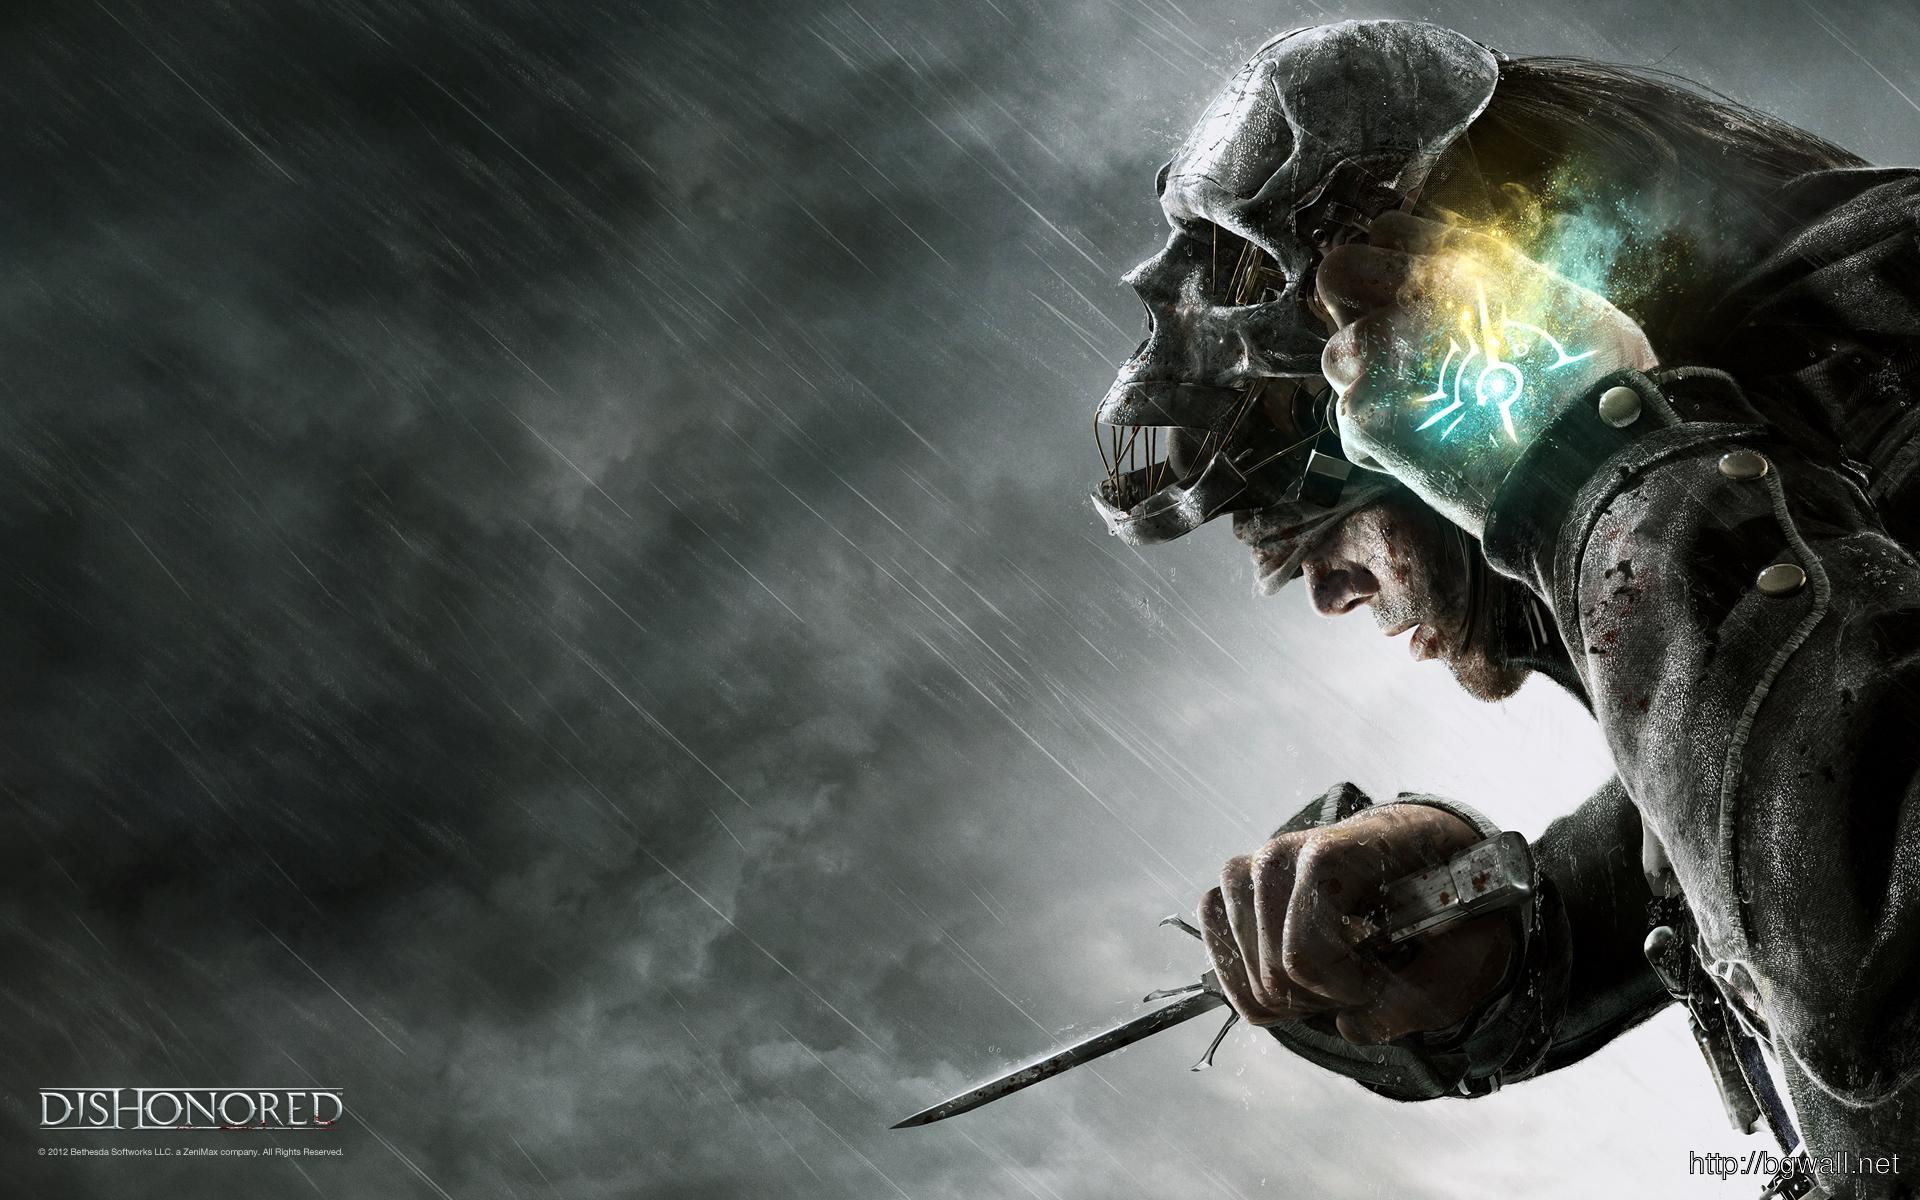 Dishonored Game Desktop Wallpaper Full Size